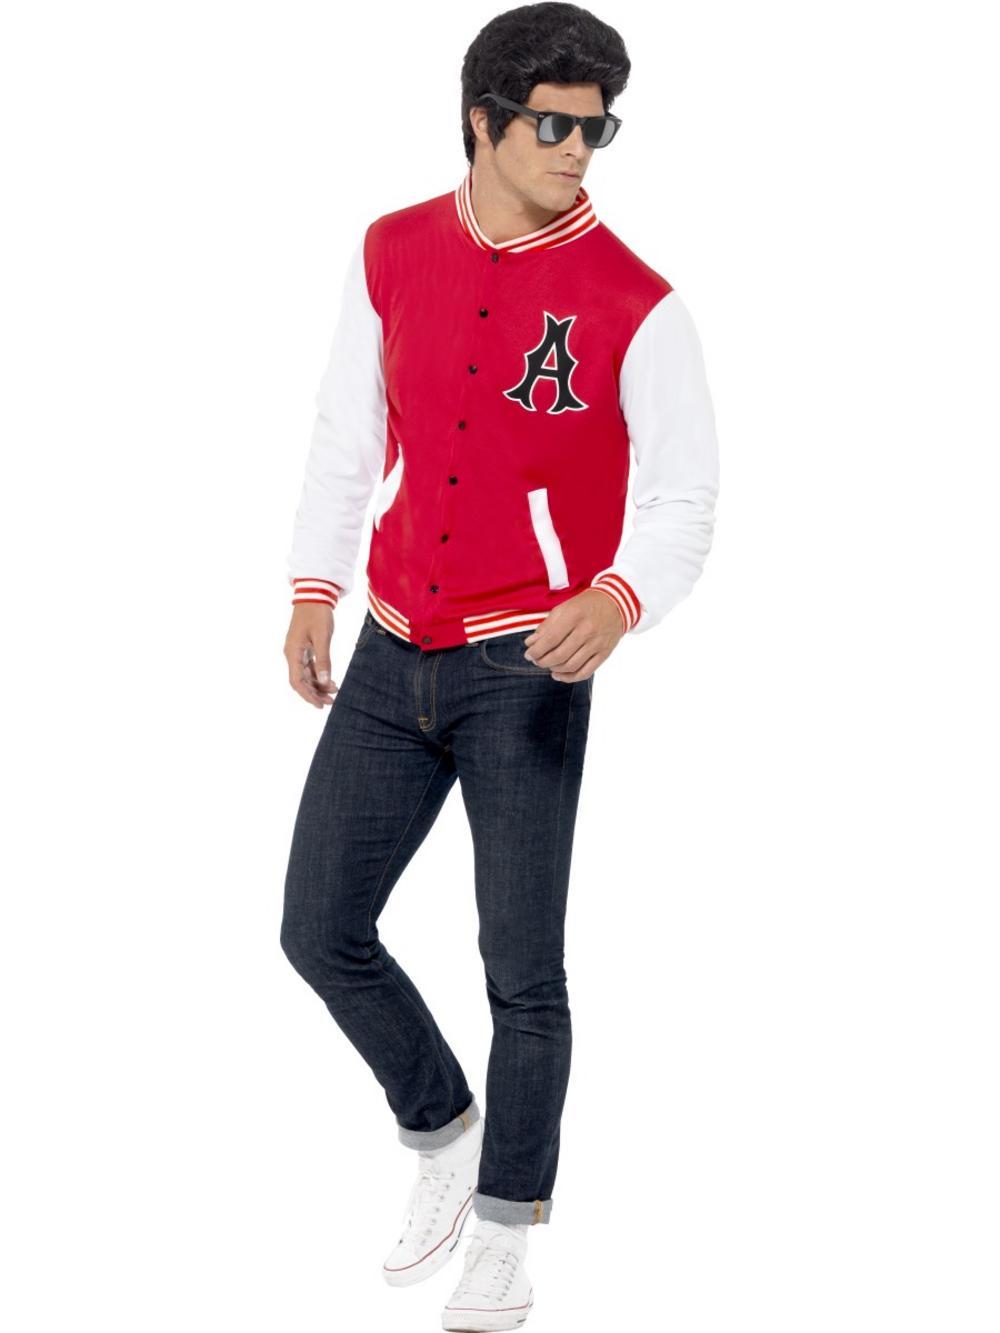 50's College Jock Letterman Jacket